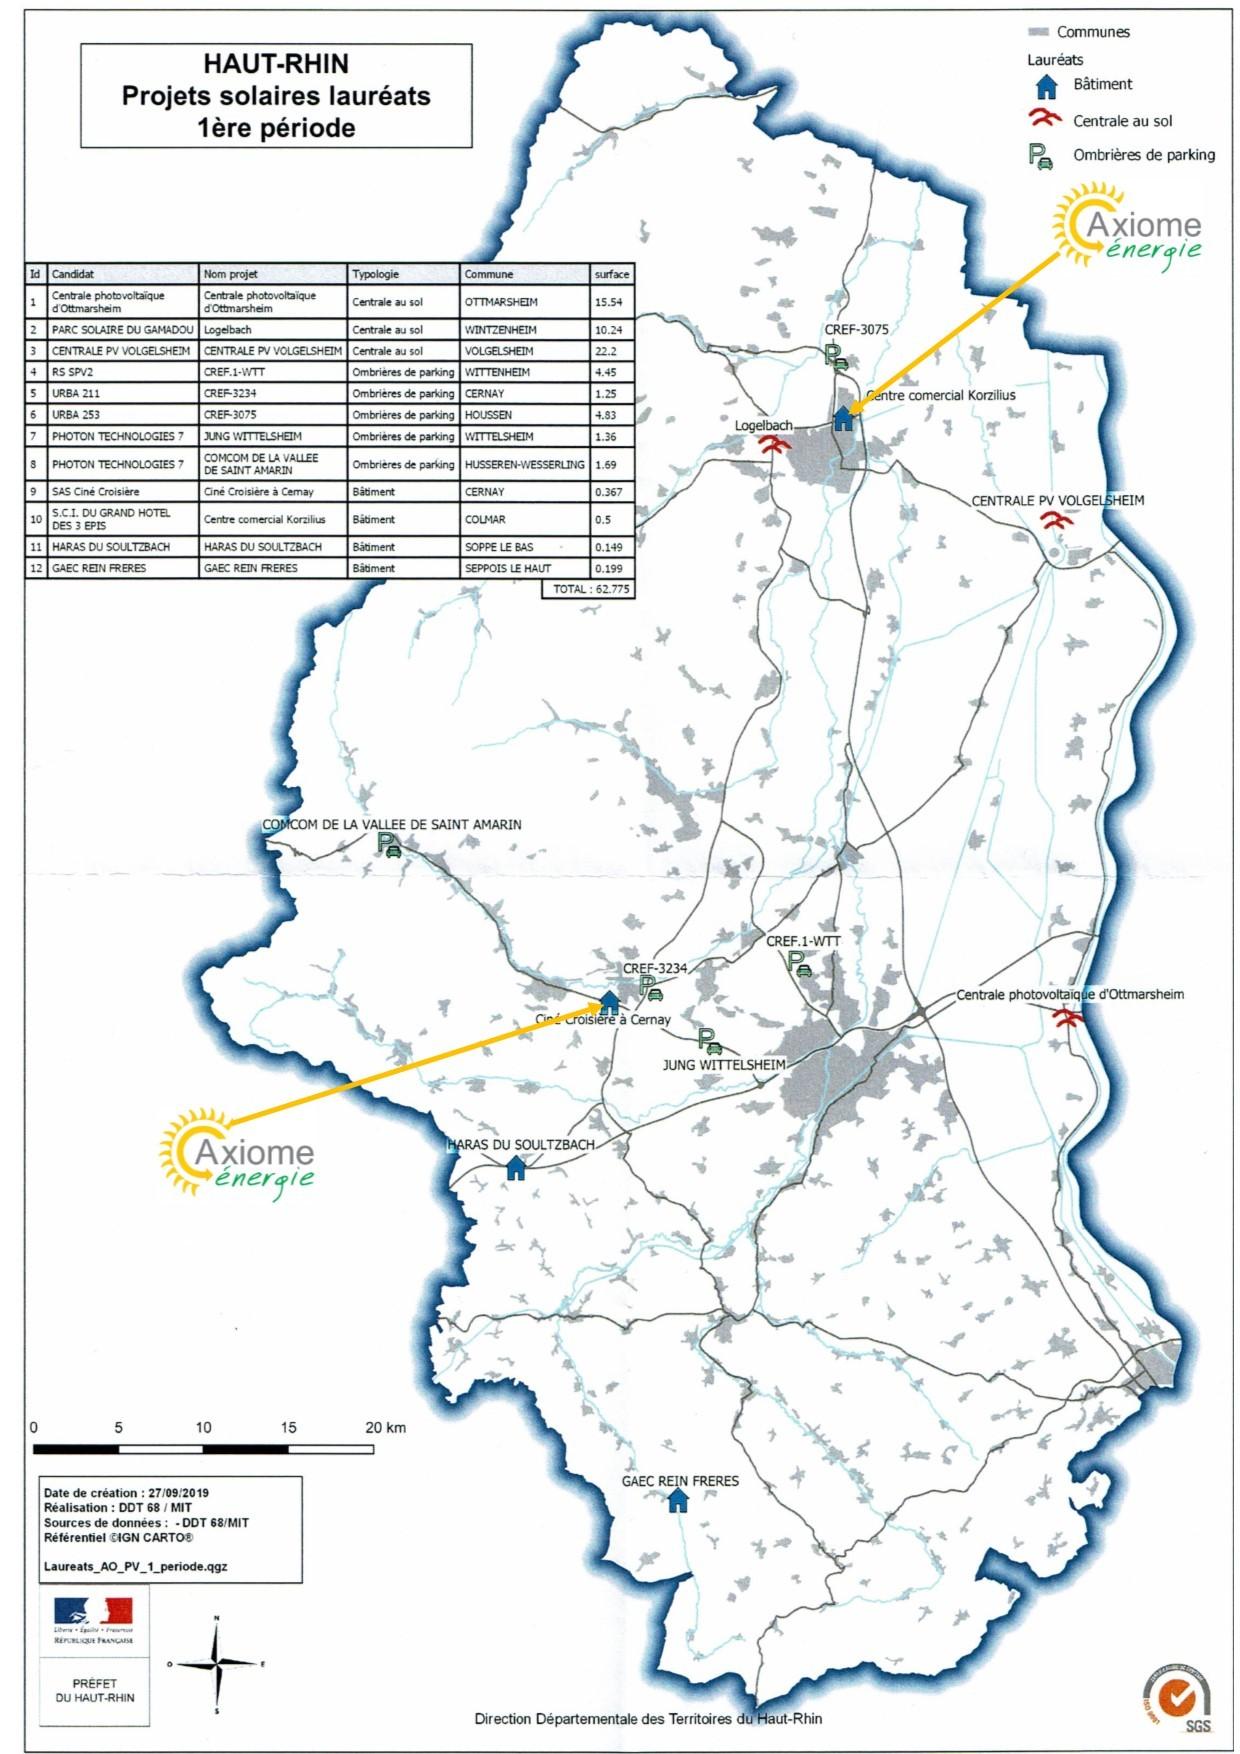 Carte des laureats AO post Fessenheim 1ere periode AxEn - Actualité